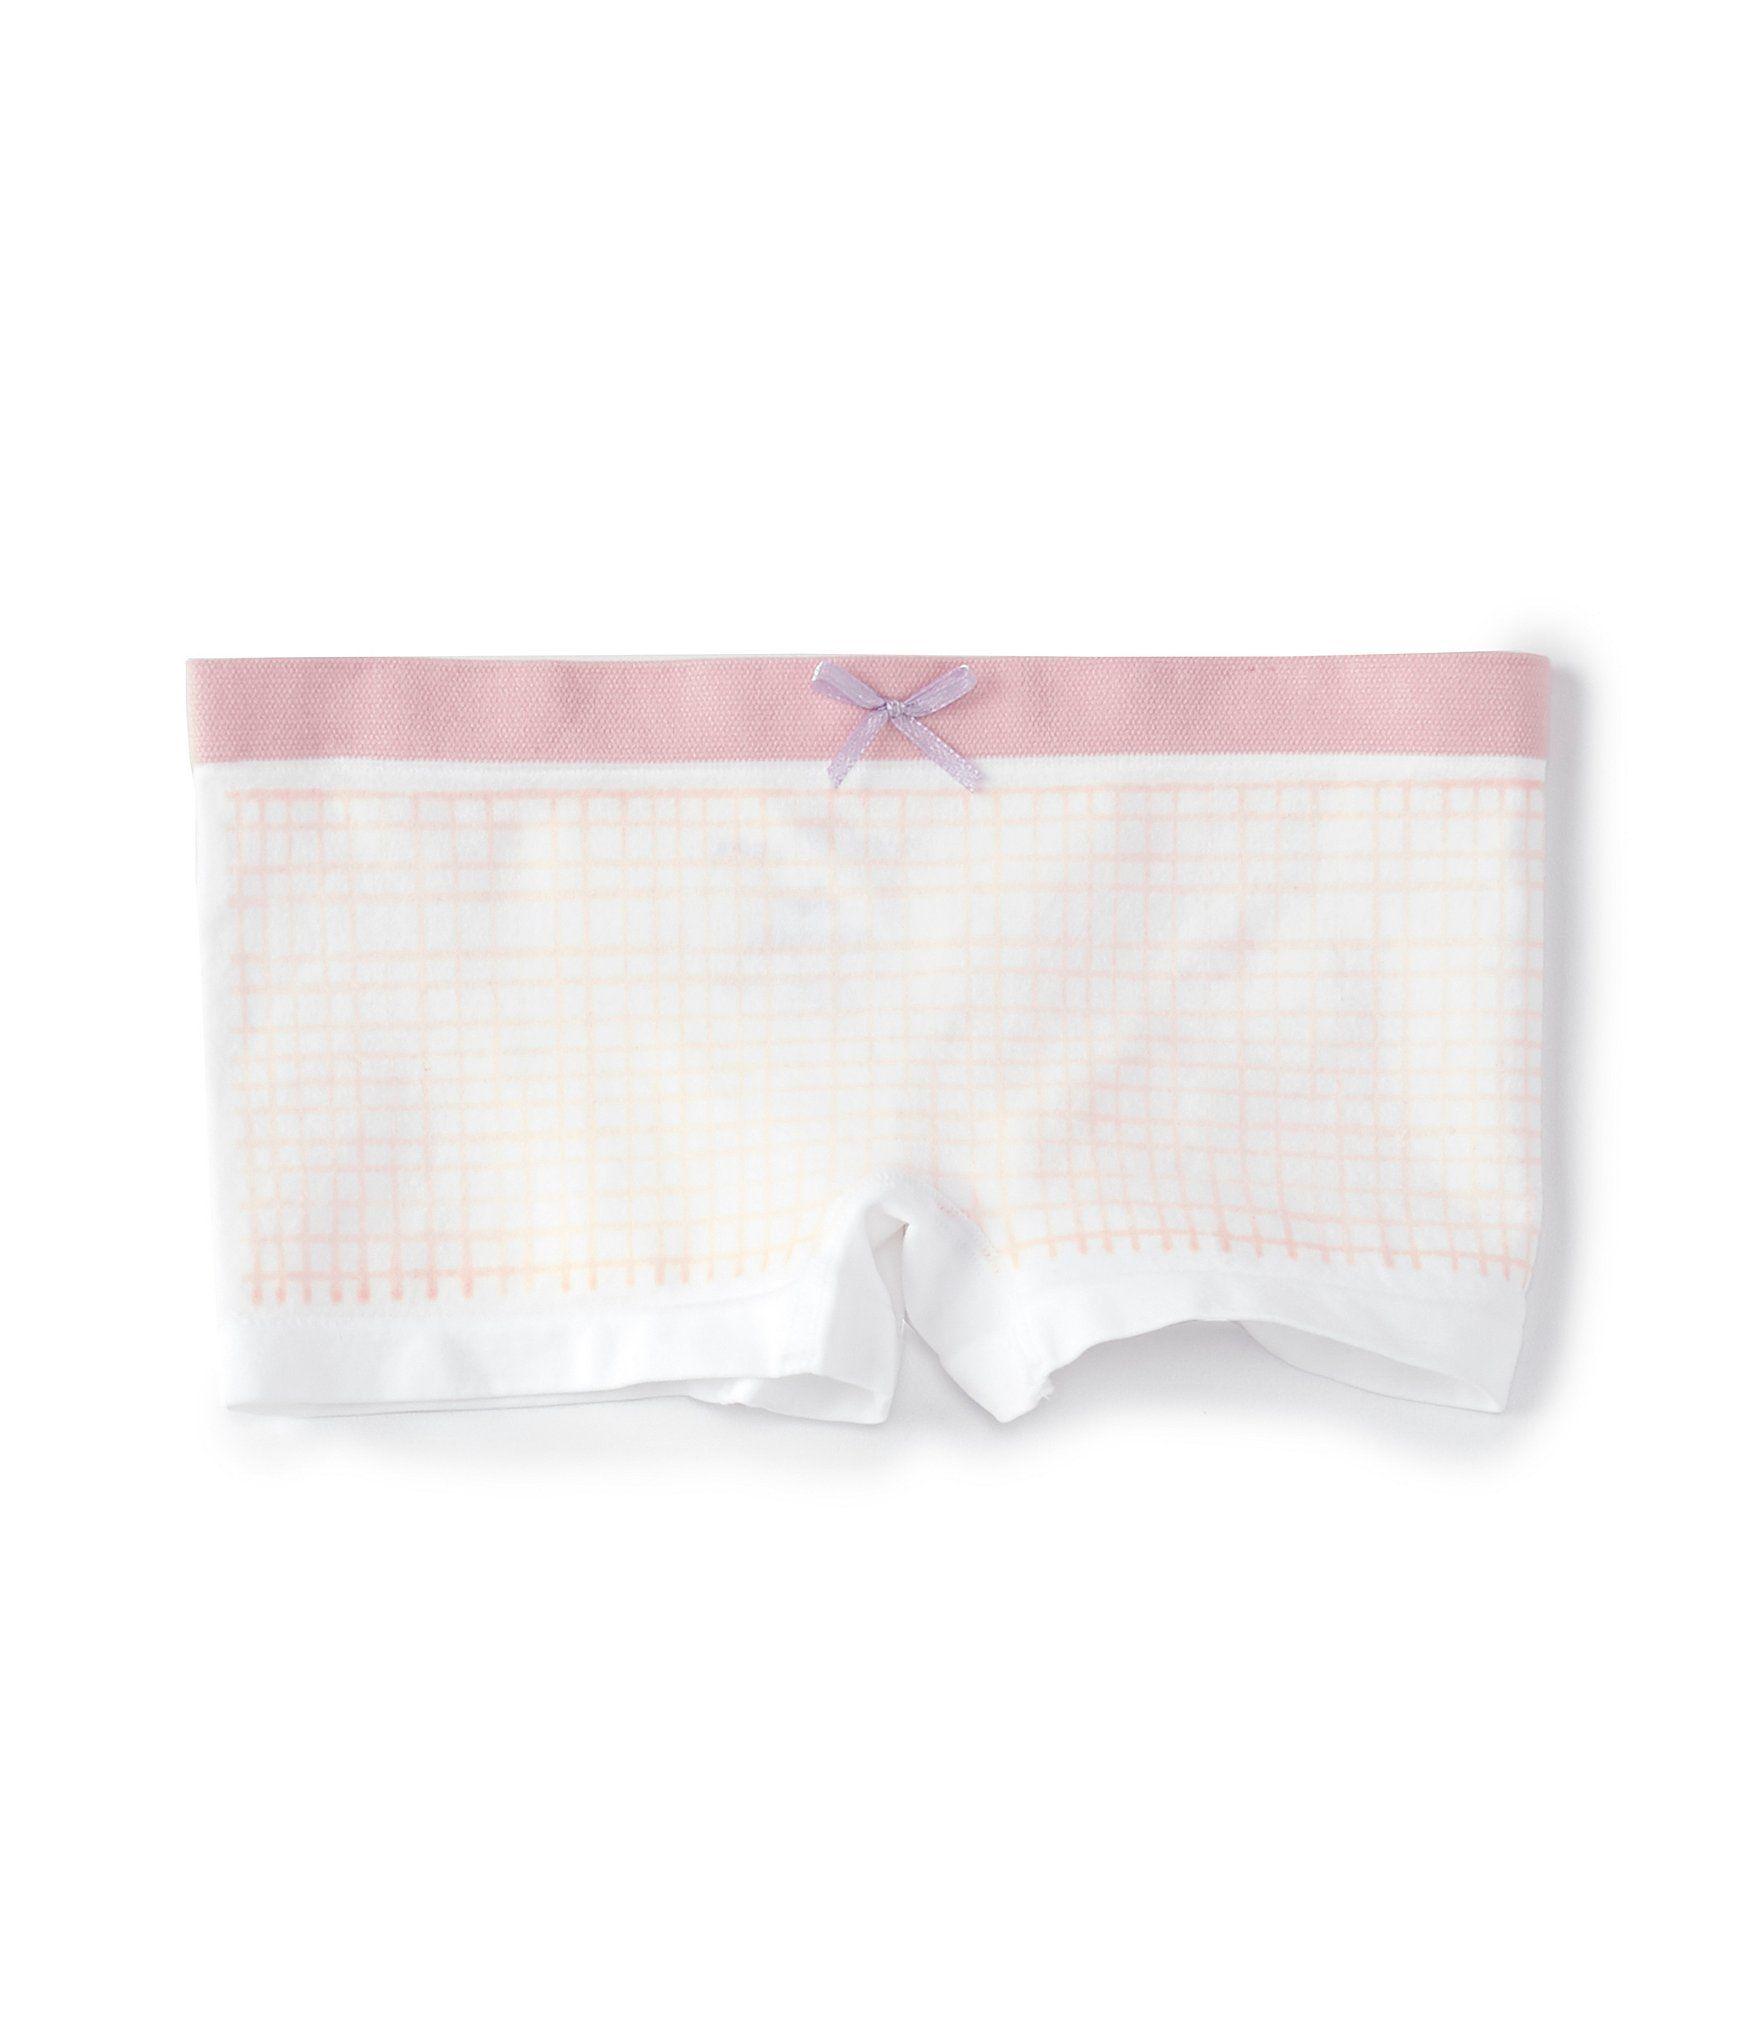 Copper Key Big Girls 7-16 Brushed Minishort Panties -  XL